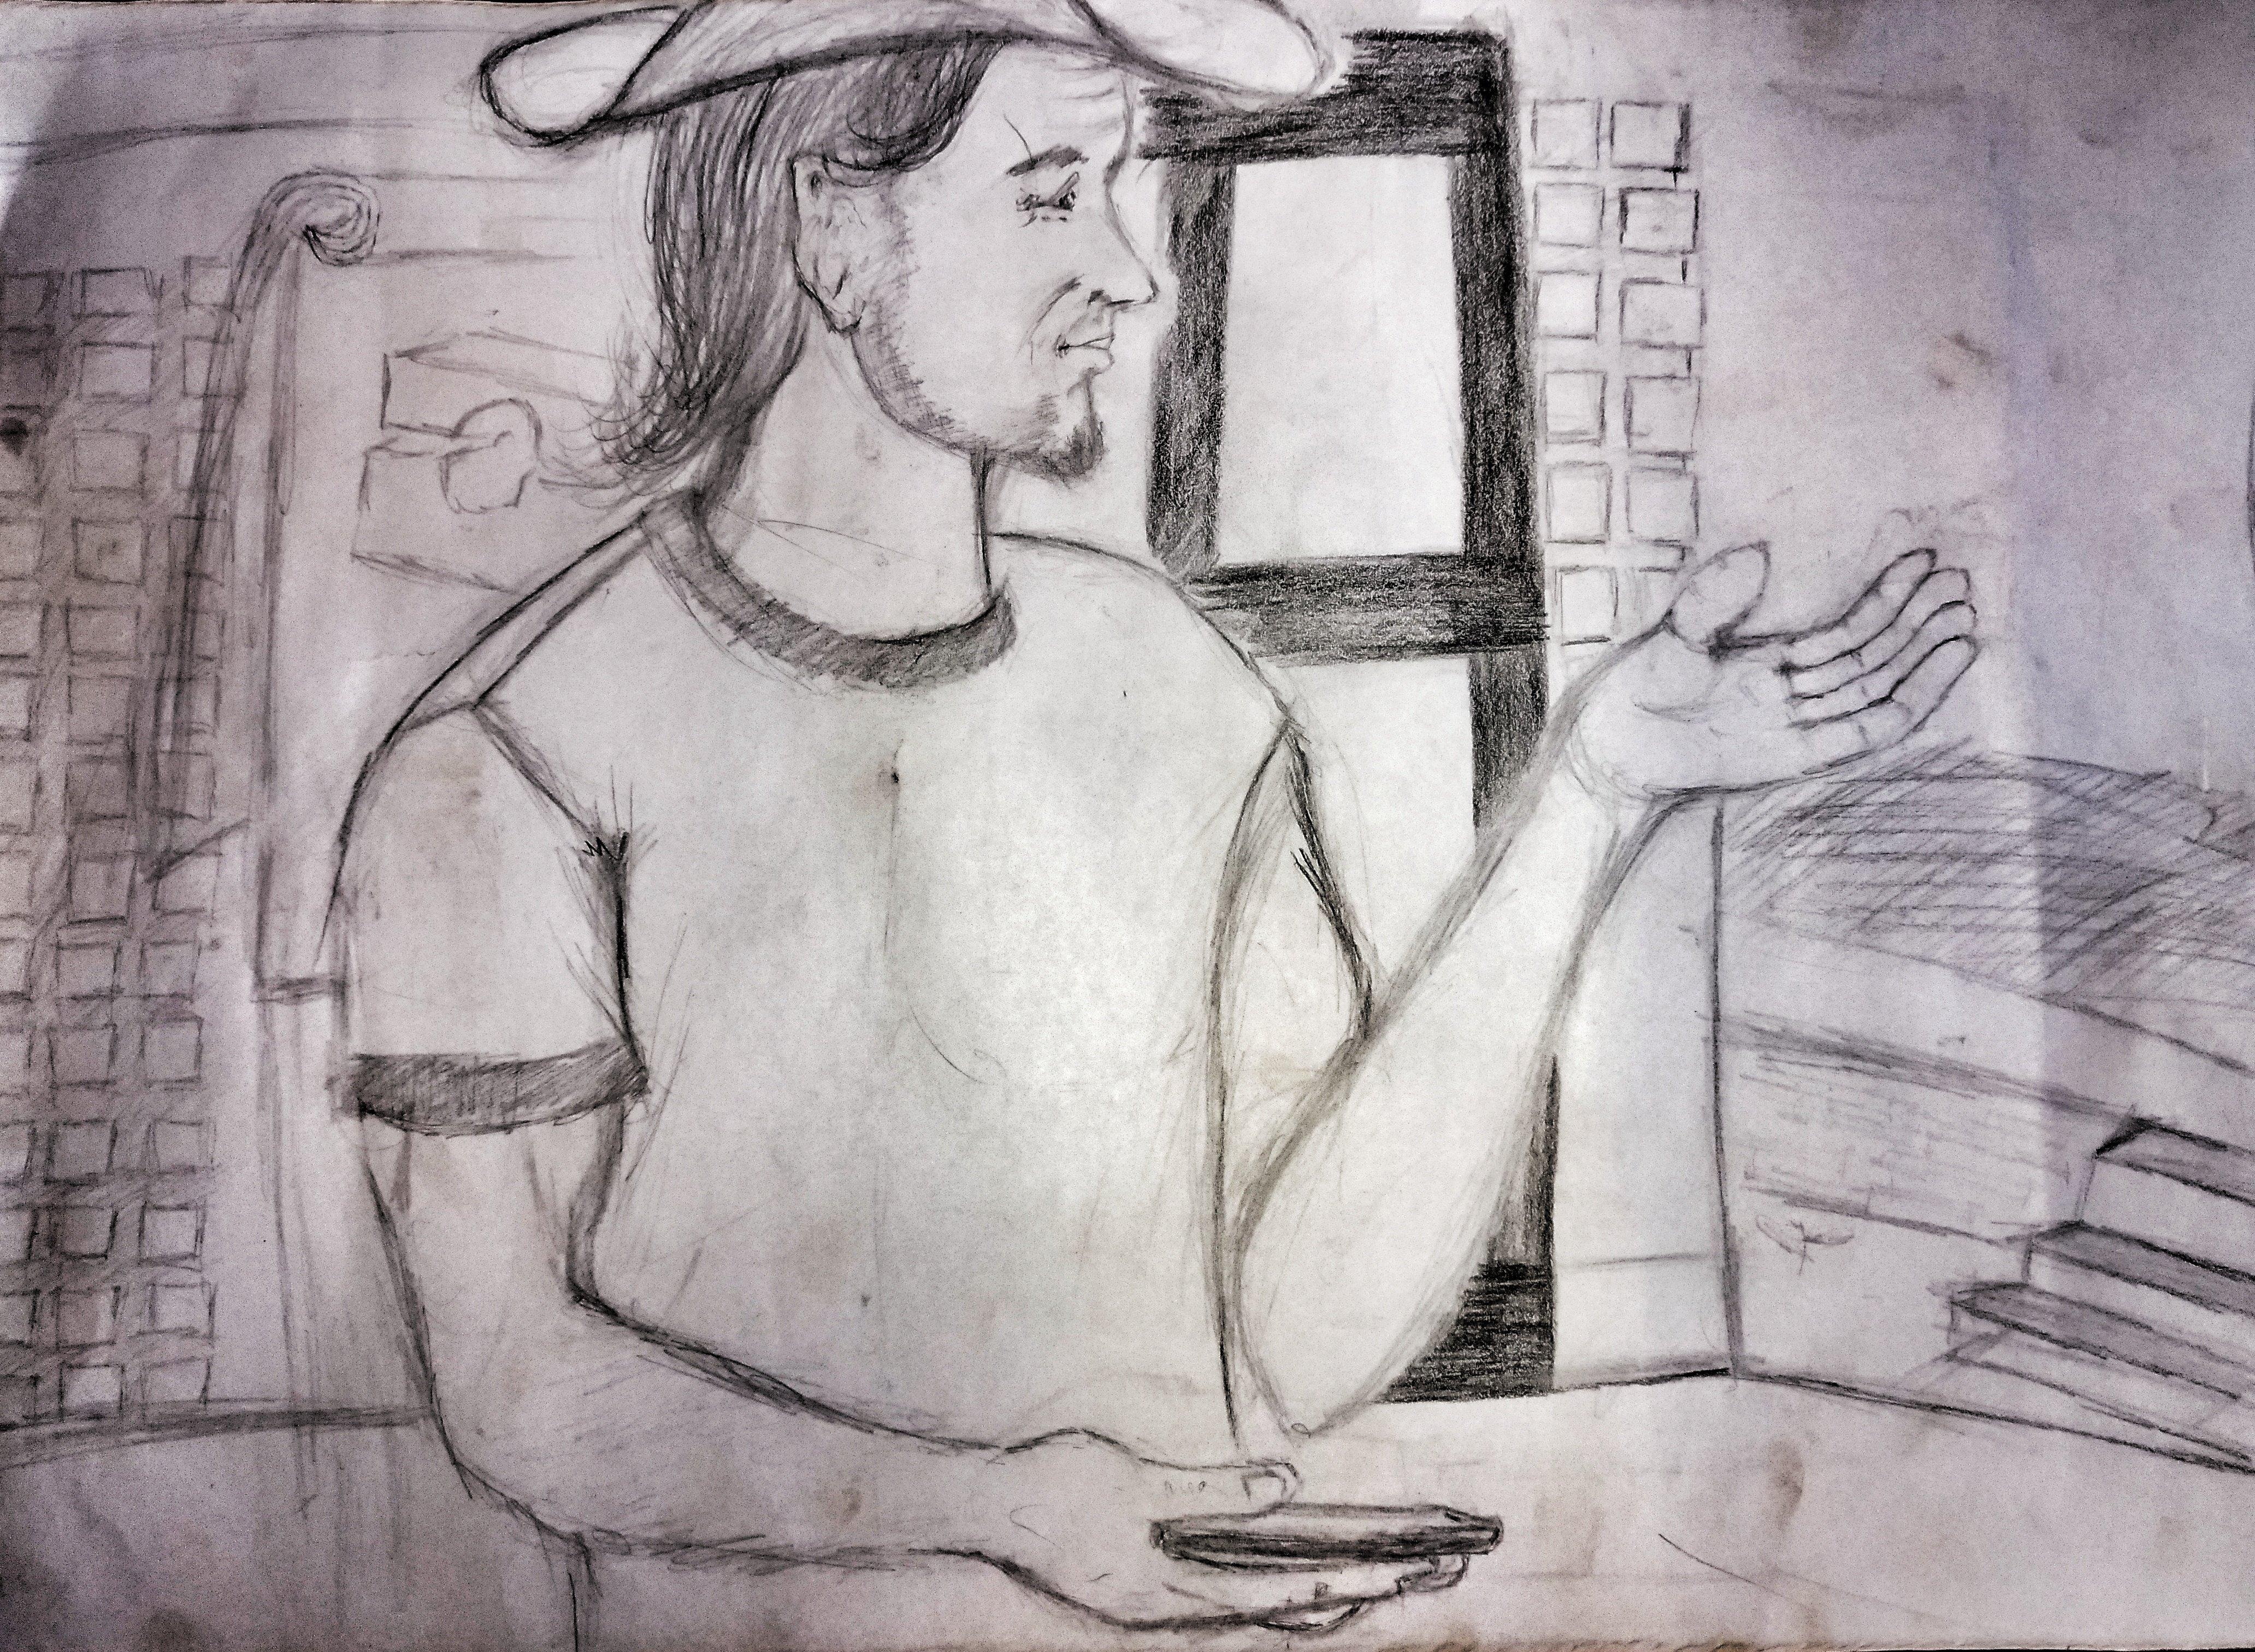 'Tim teaching Evangelism Explosion' by Joseph Ochira, one of my student workers